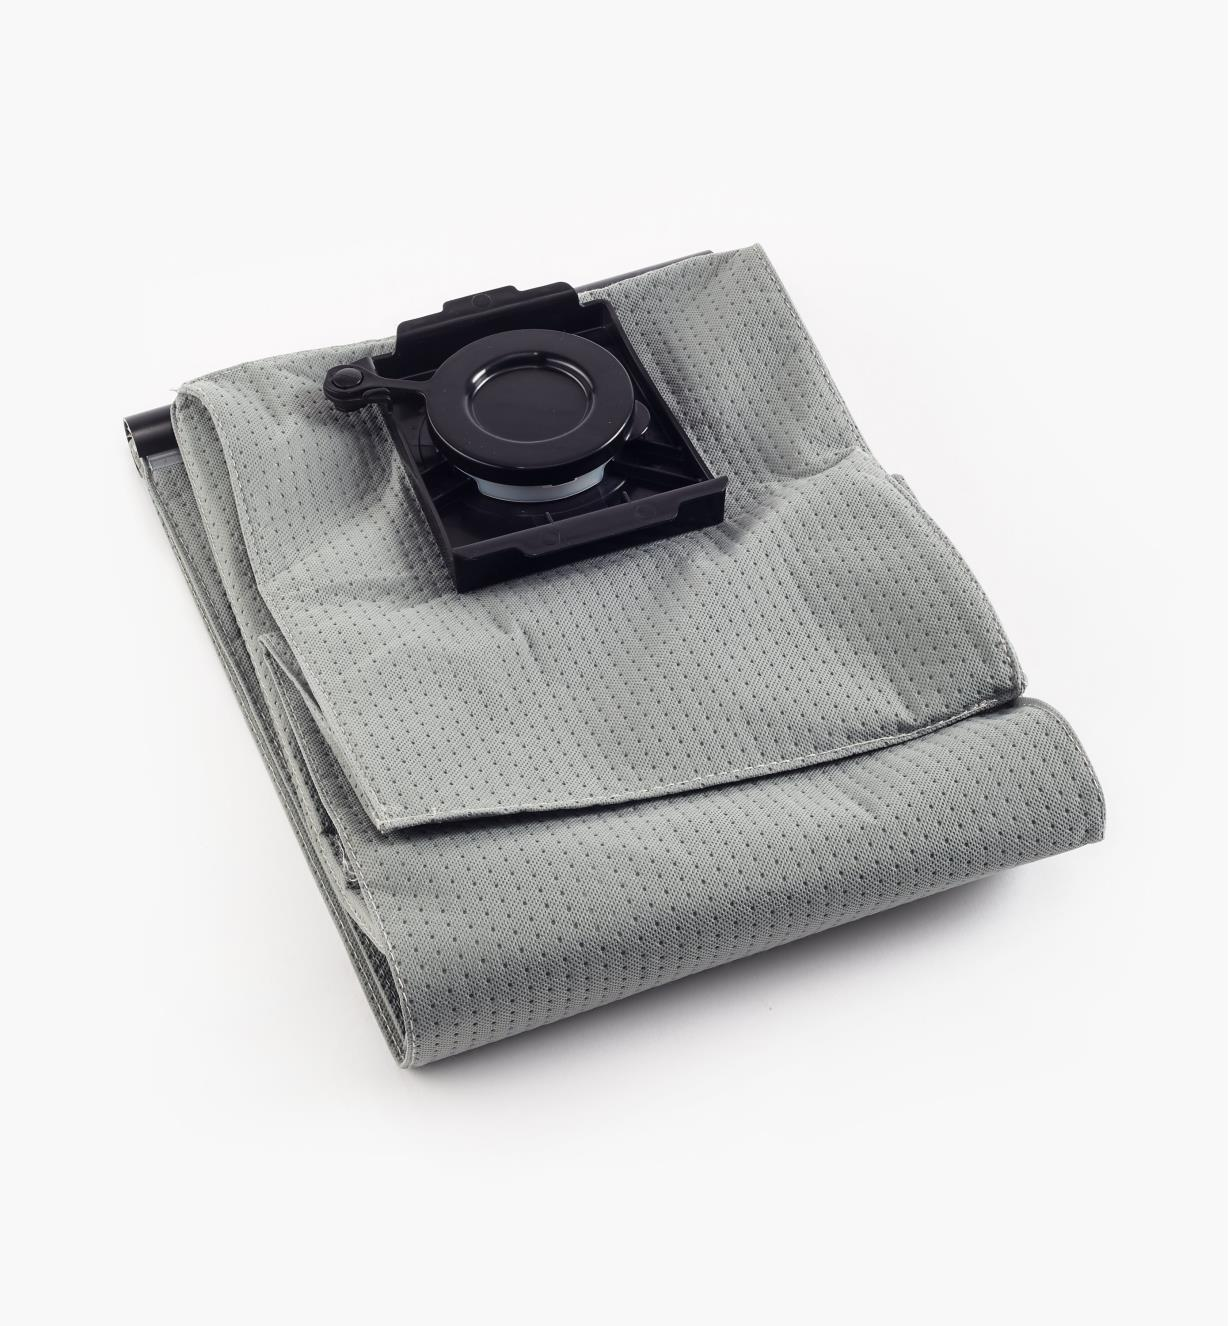 ZA496121 - Longlife Filter Bags (CT 36 E)